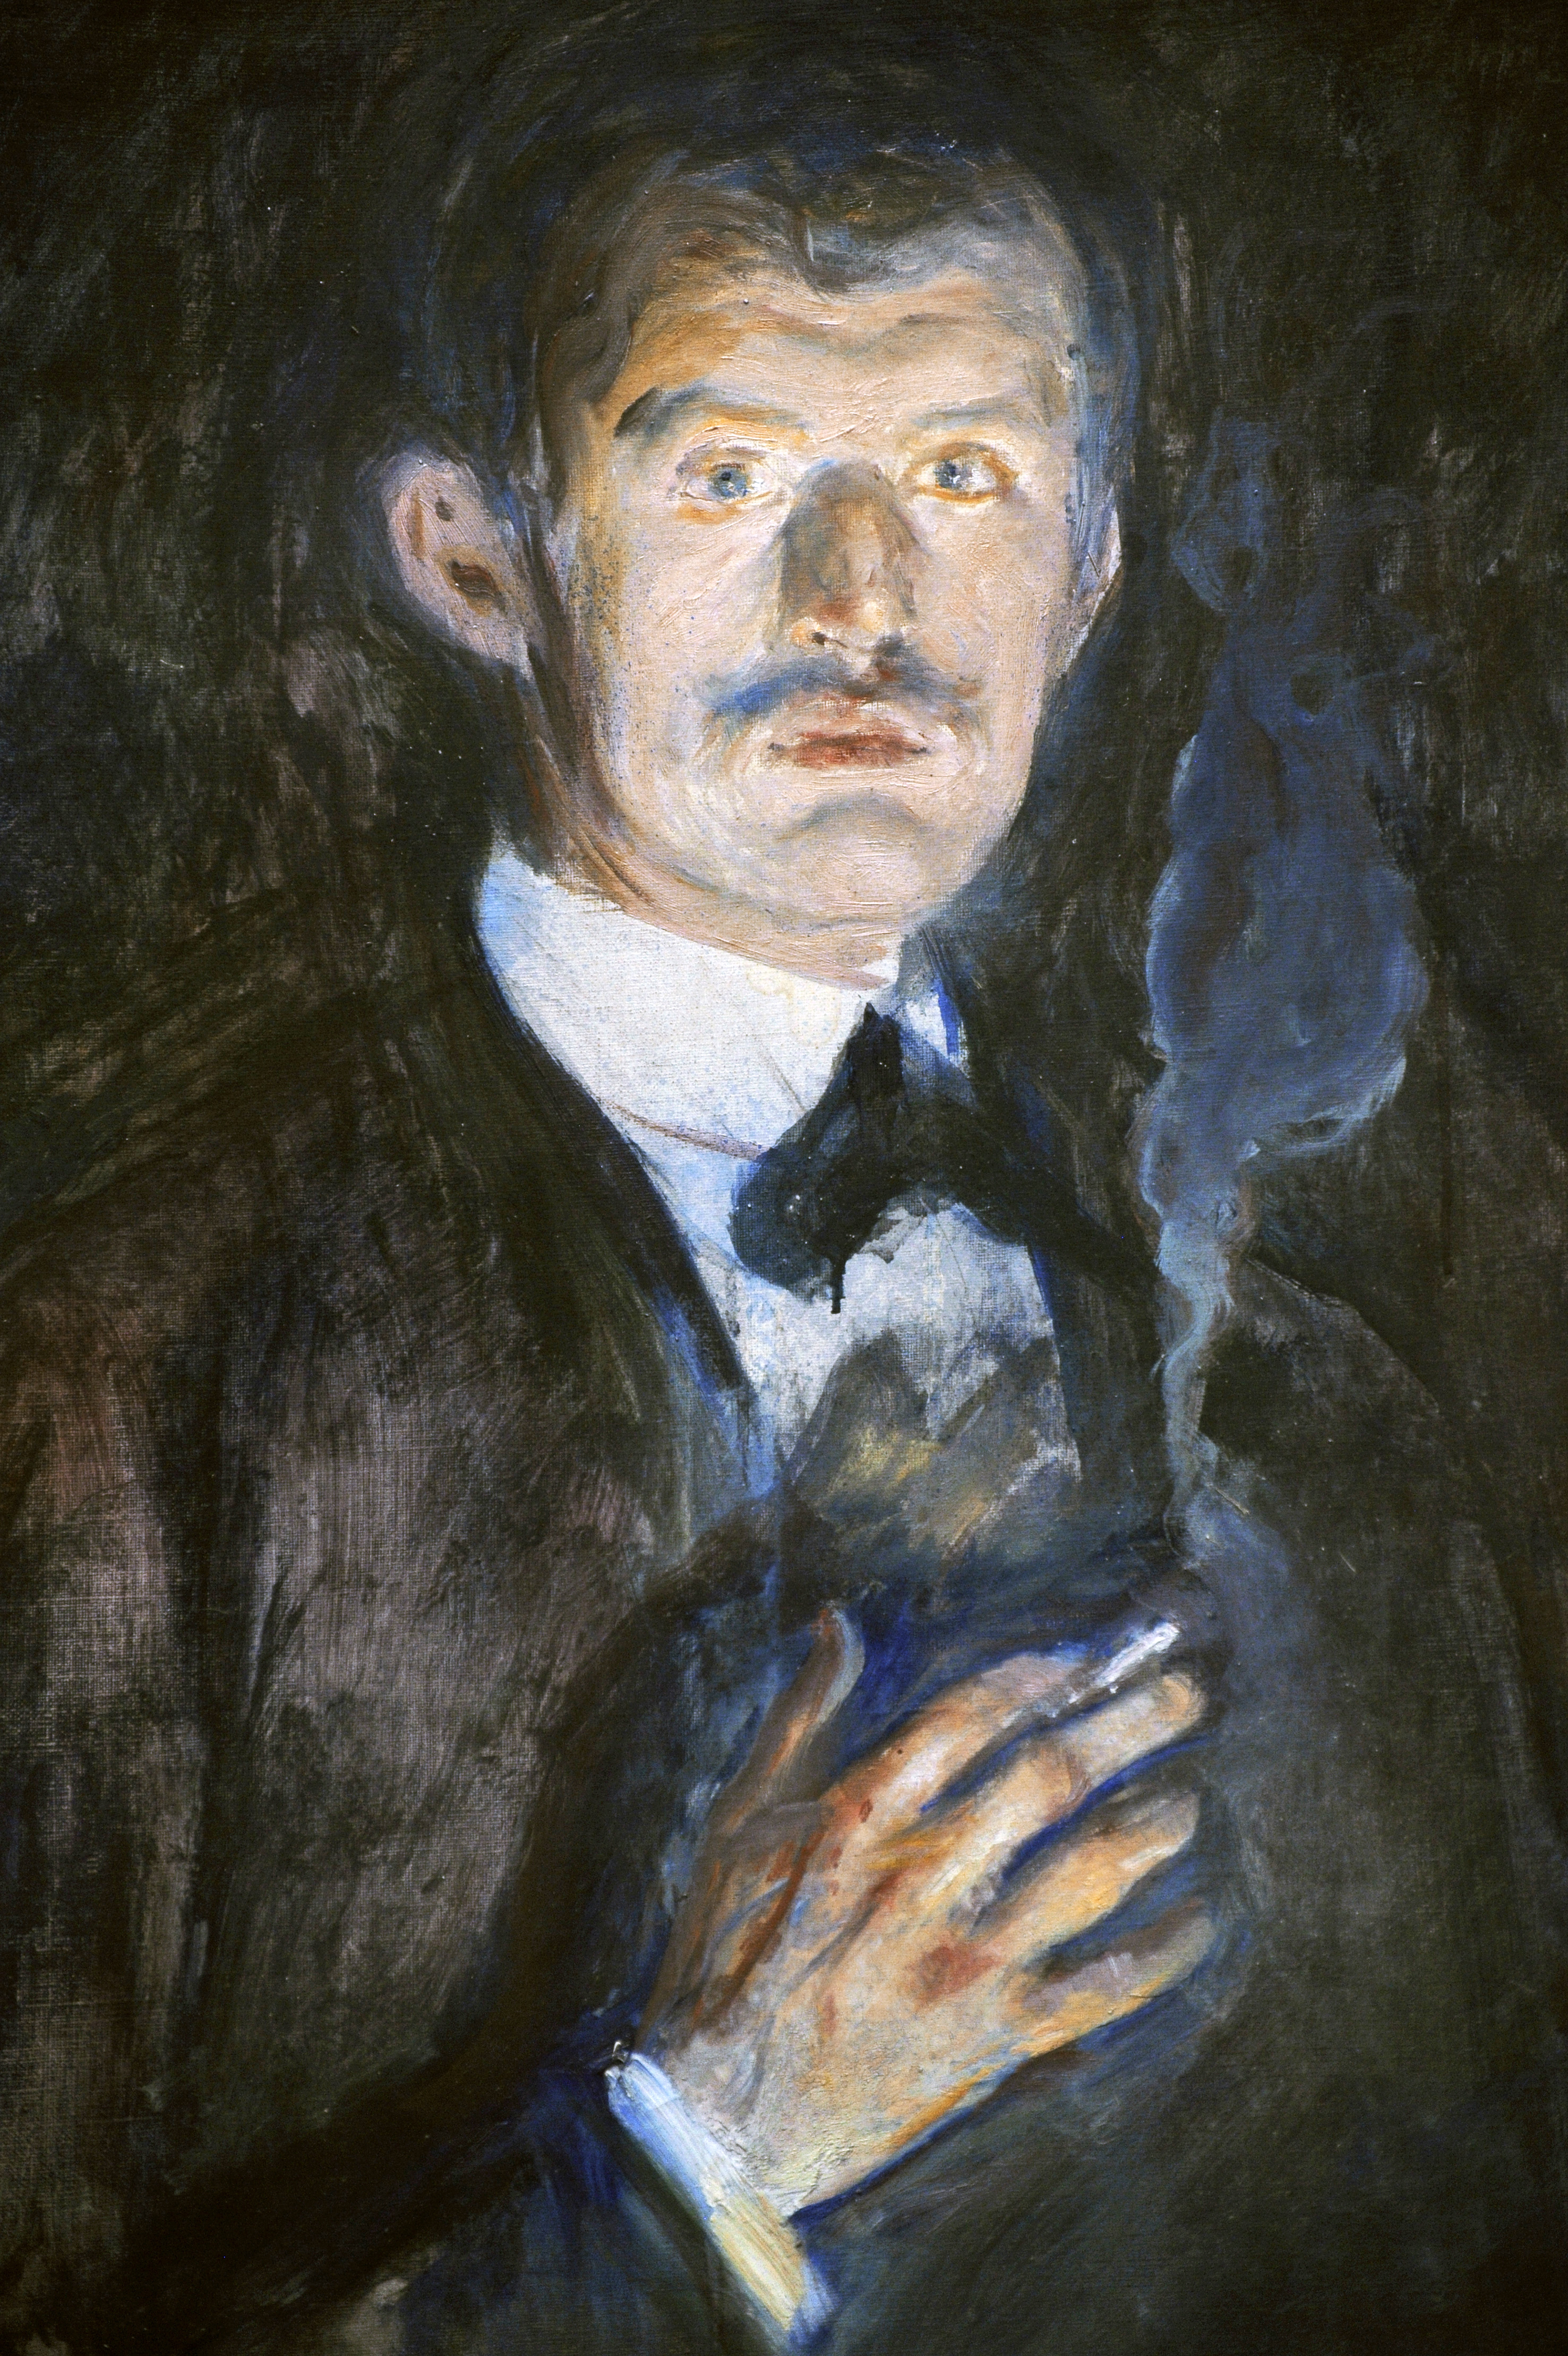 Self-Portrait with Cigarette, 1895, detail